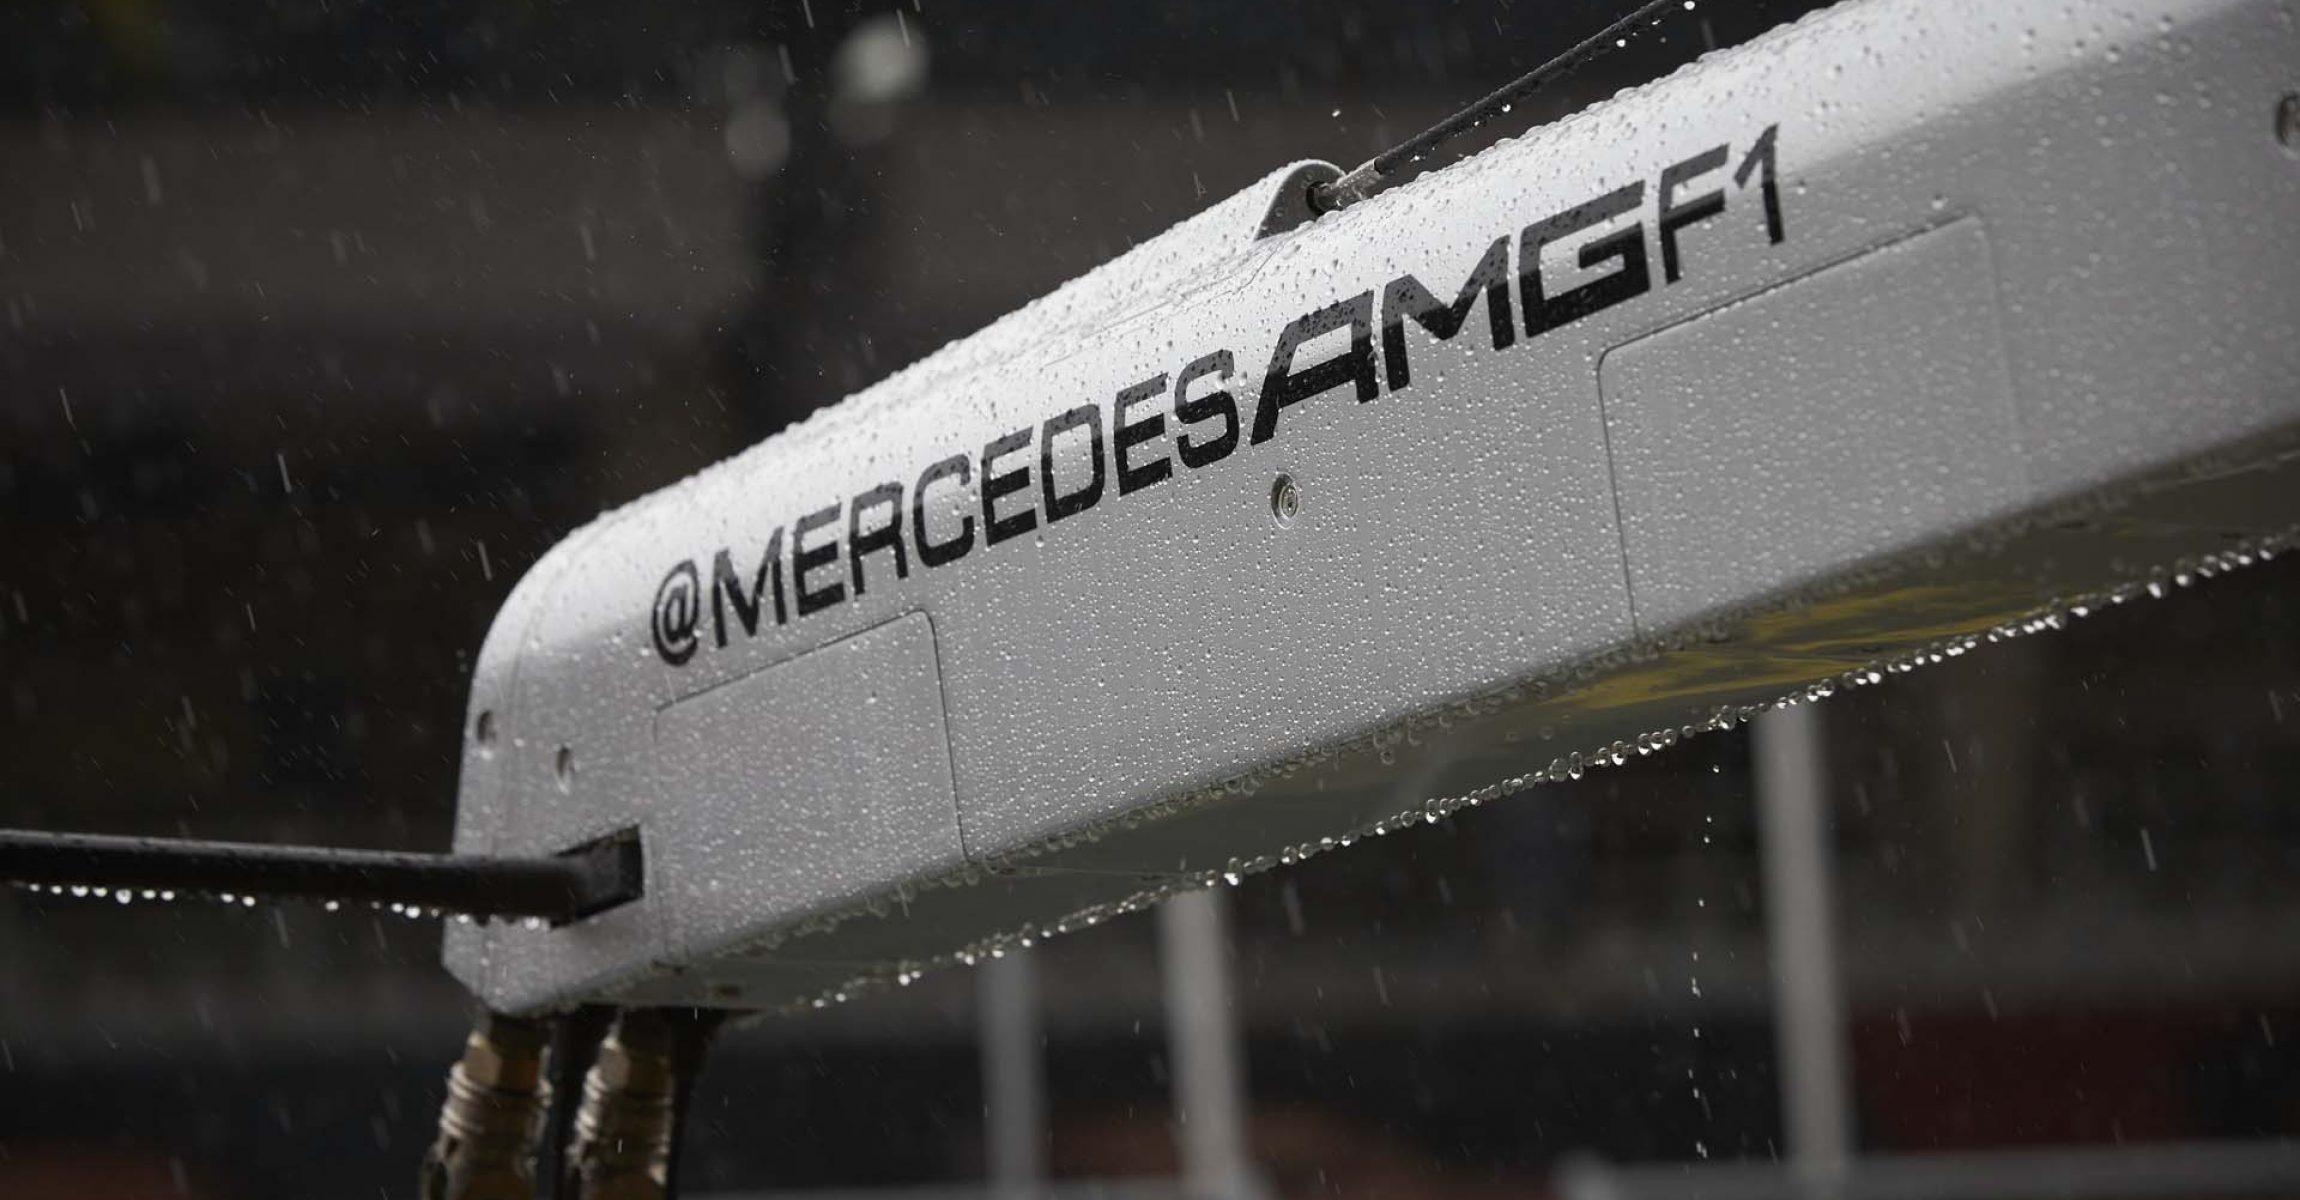 2020 Styrian Grand Prix, Saturday - Steve Etherington Mercedes AMG F1 Logo rain wet